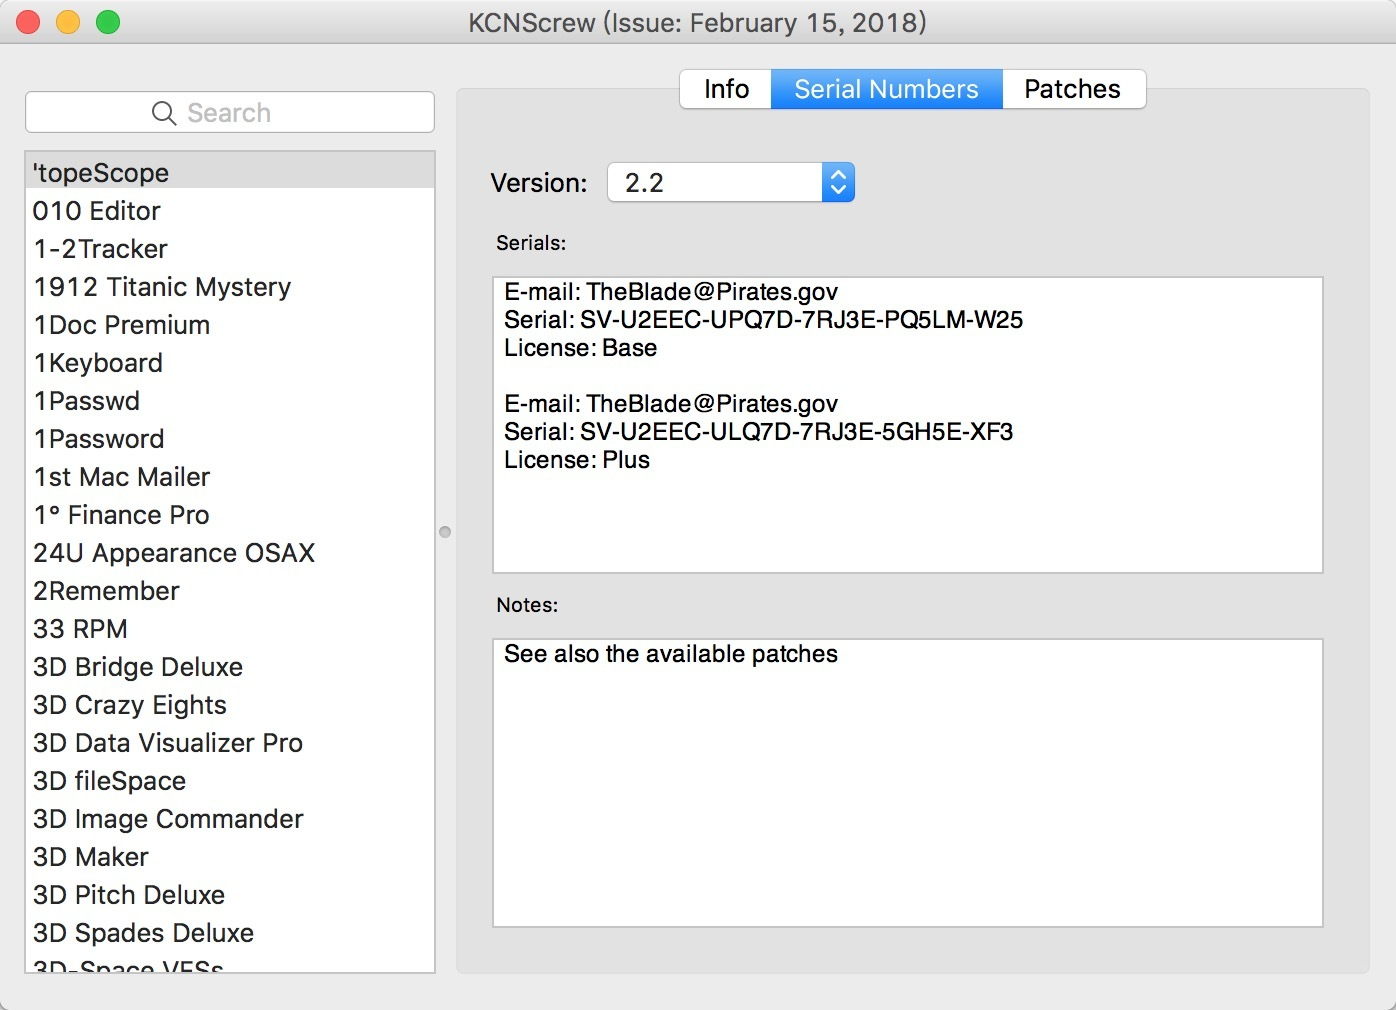 KCNcrew Pack 05-15-20 正版软件序列号、激活码分享工具-马克喵